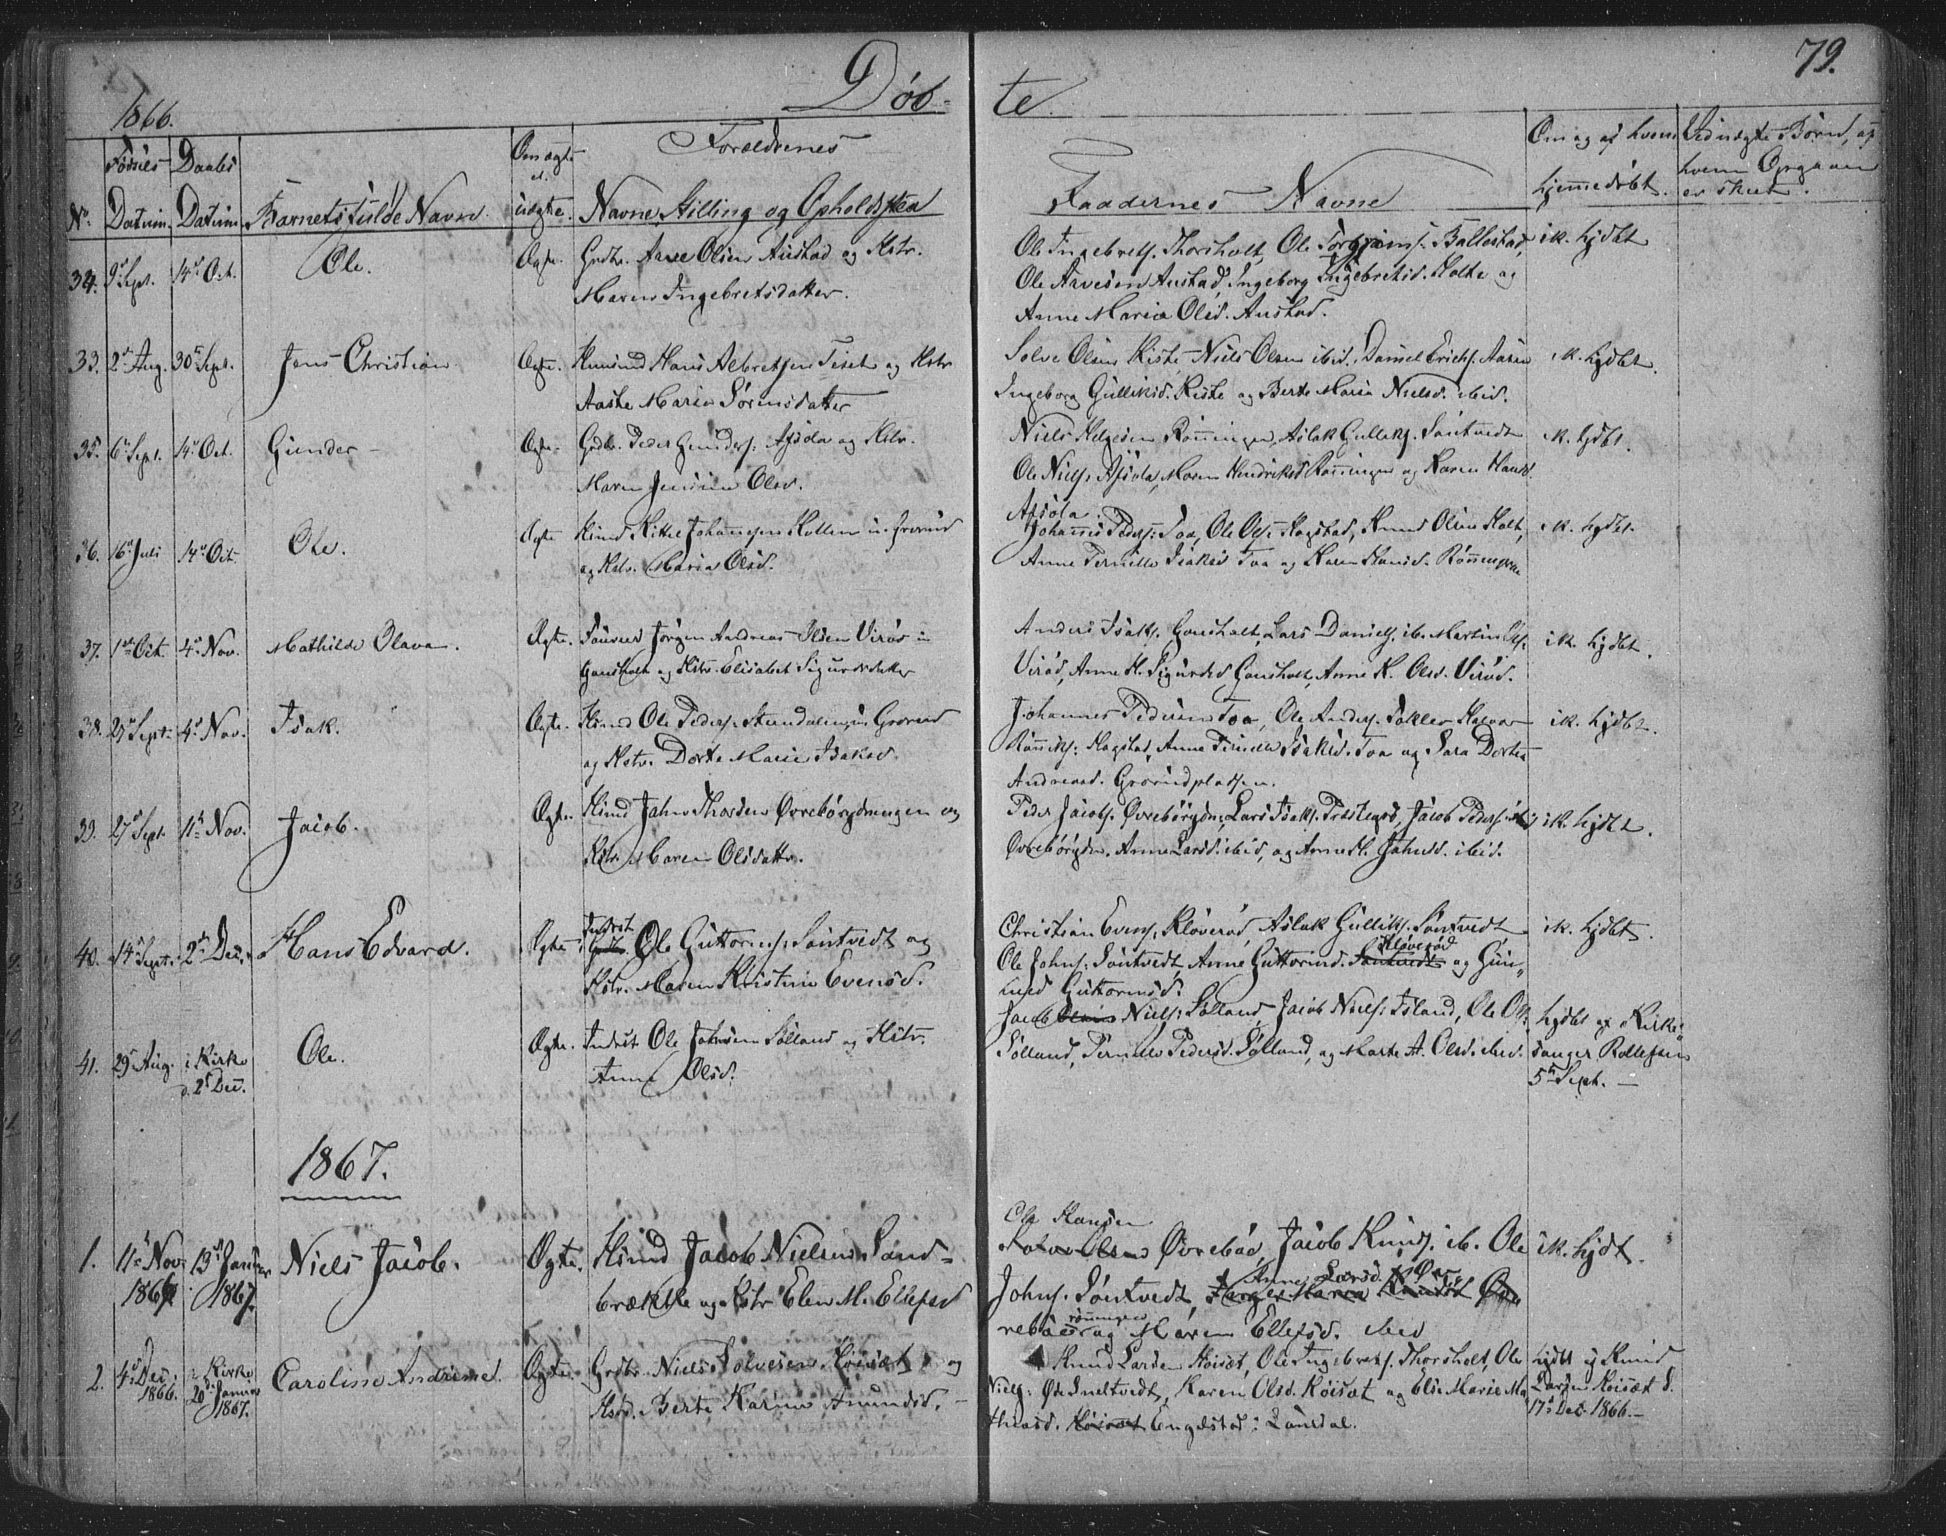 SAKO, Siljan kirkebøker, F/Fa/L0001: Parish register (official) no. 1, 1831-1870, p. 79